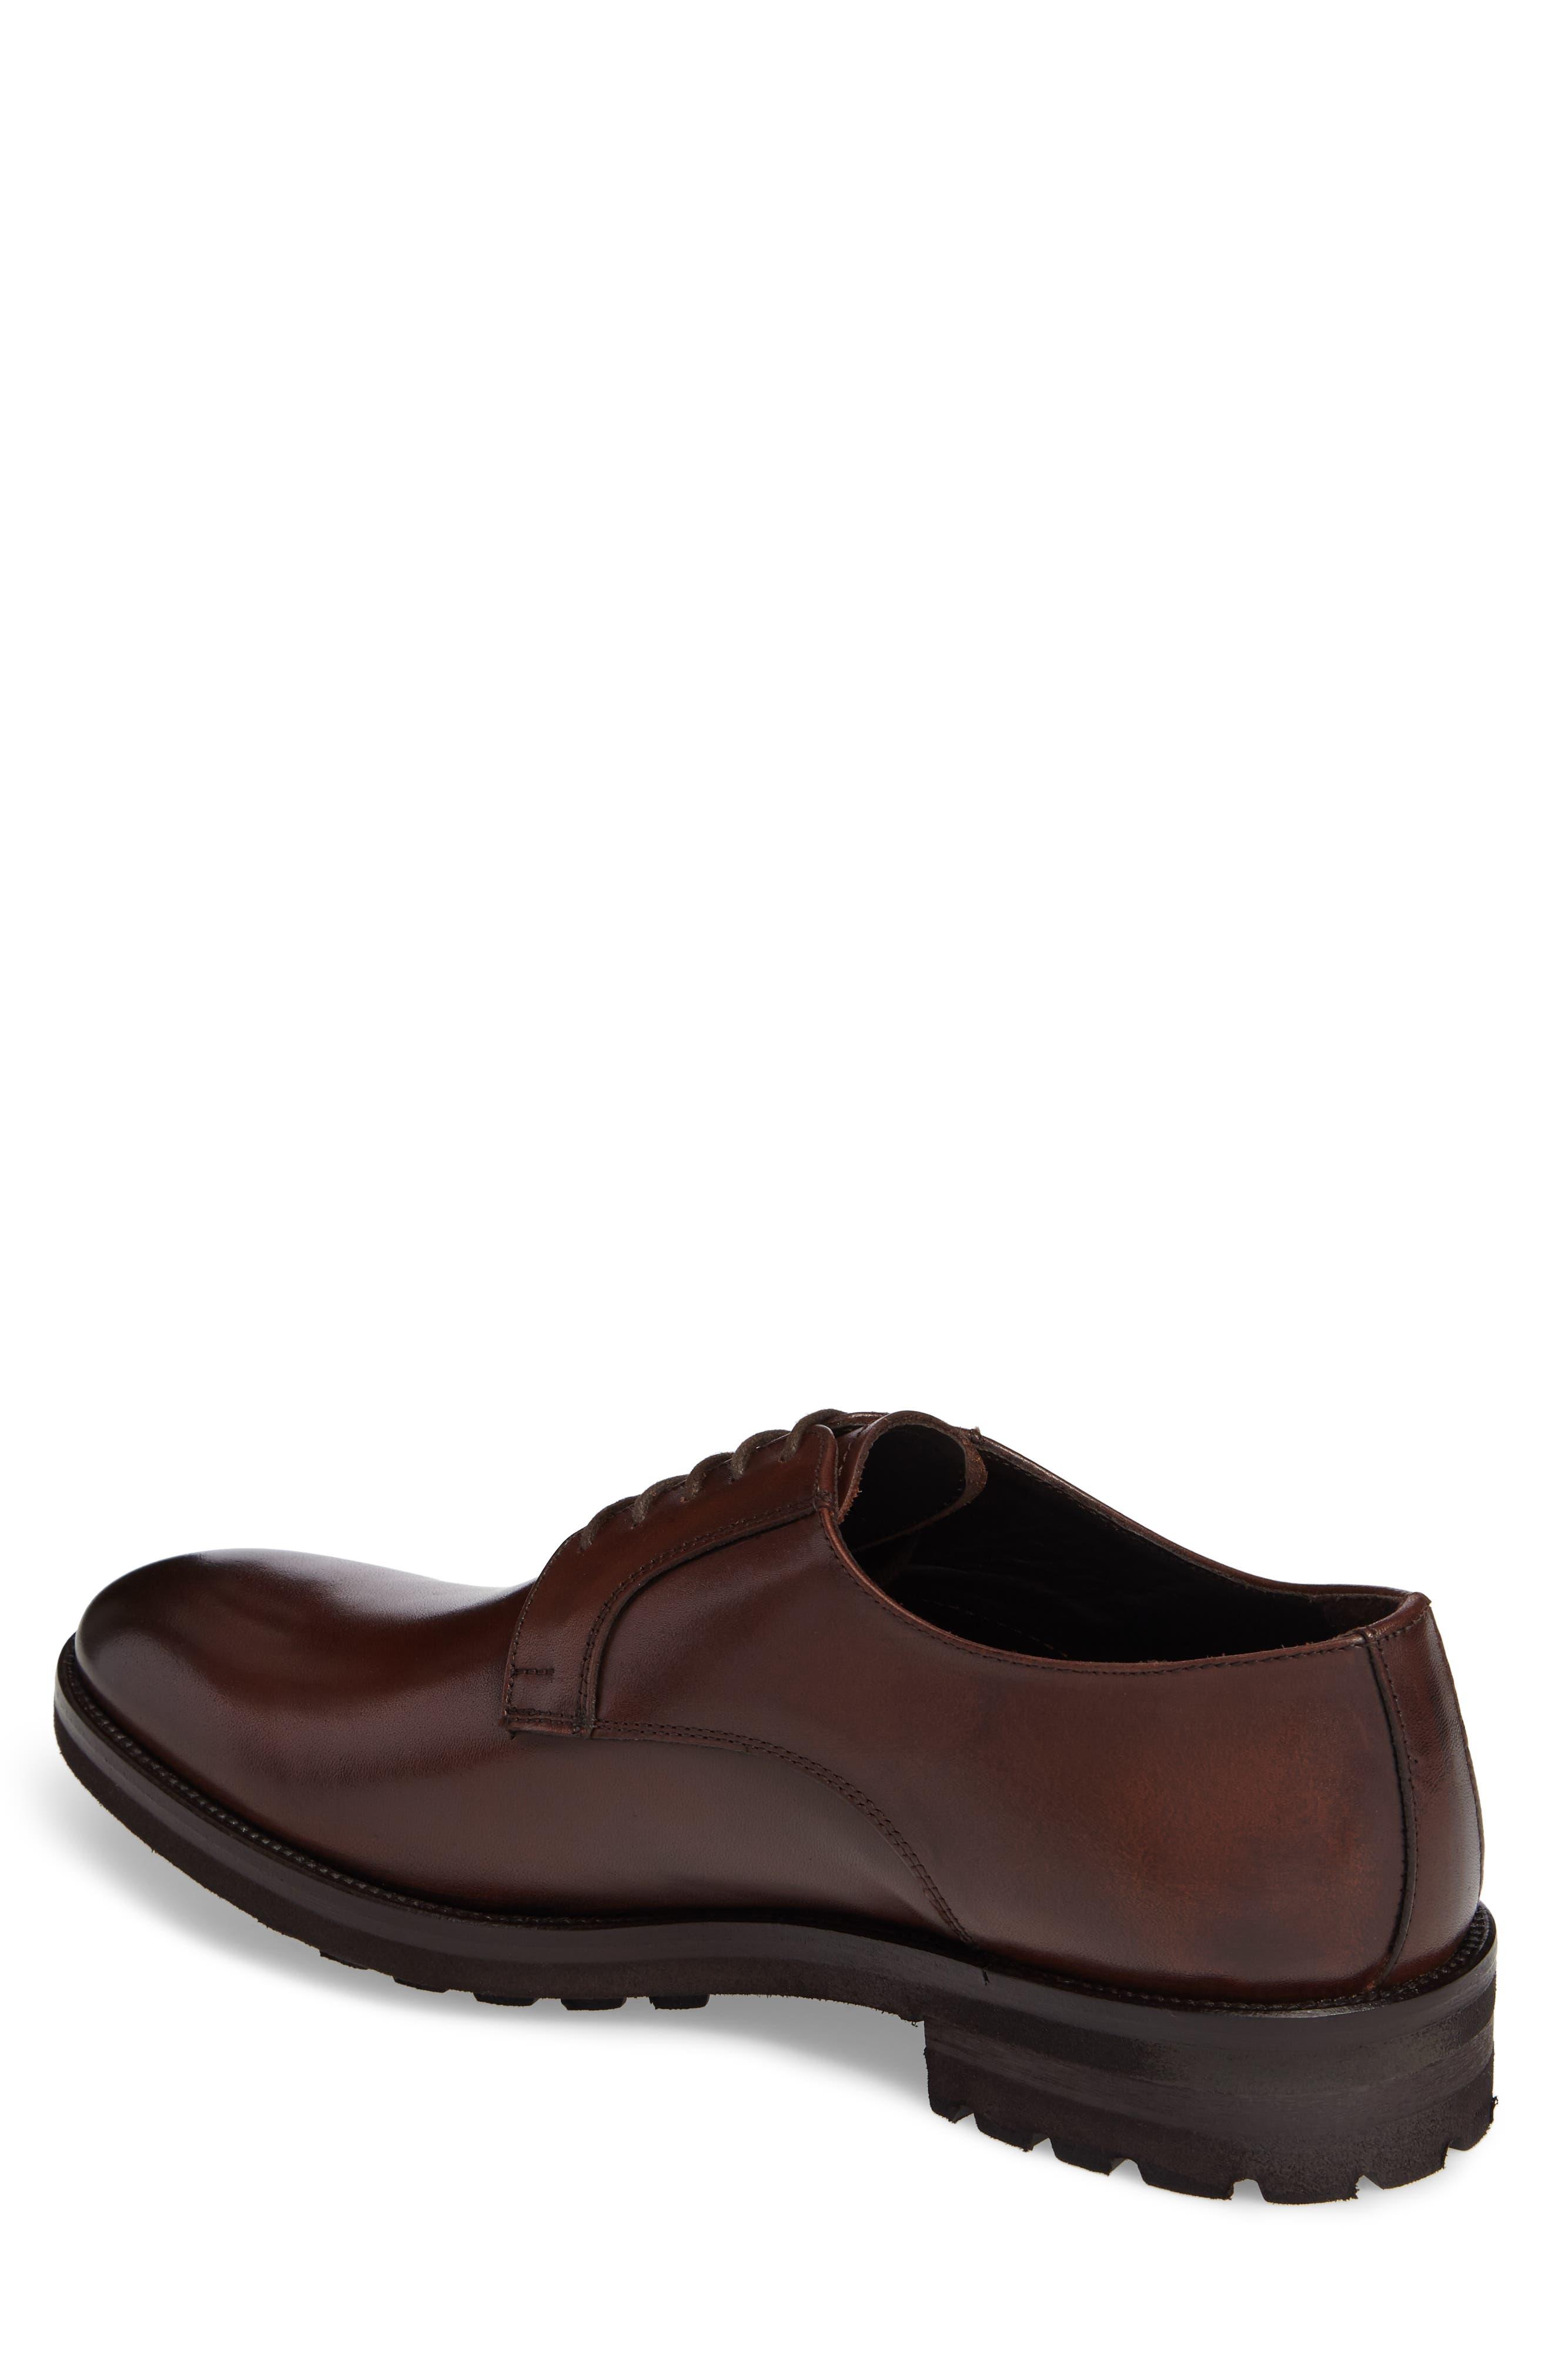 Martell Plain Toe Derby,                             Alternate thumbnail 2, color,                             Marrone